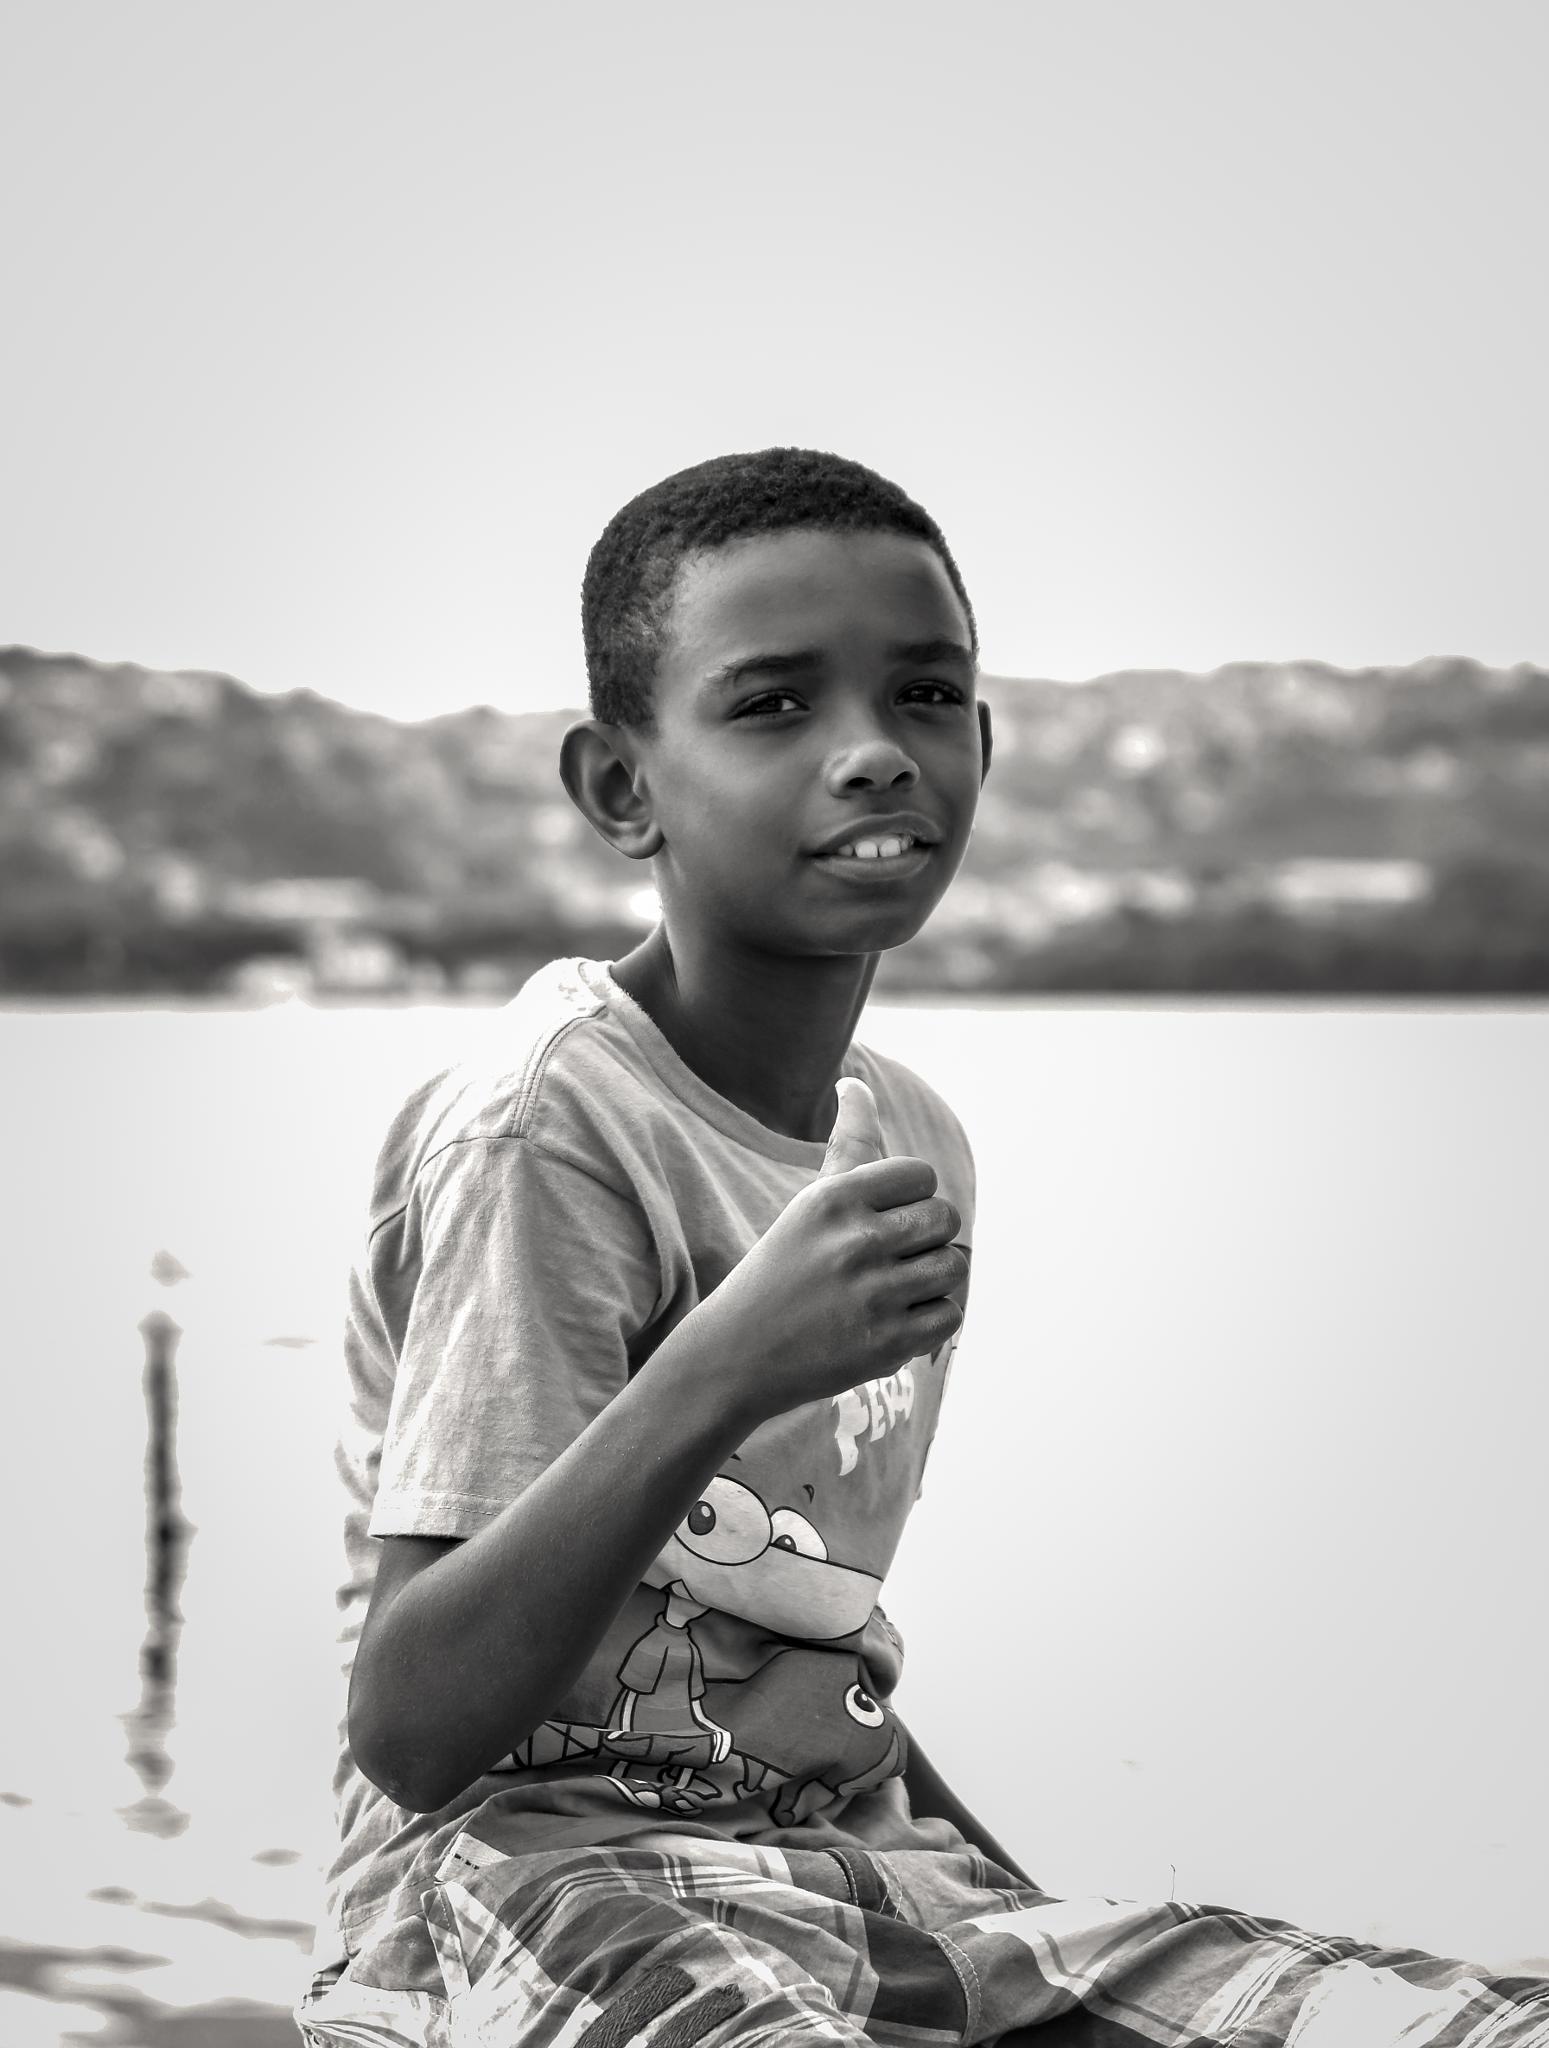 O menino by Robson Carvalho